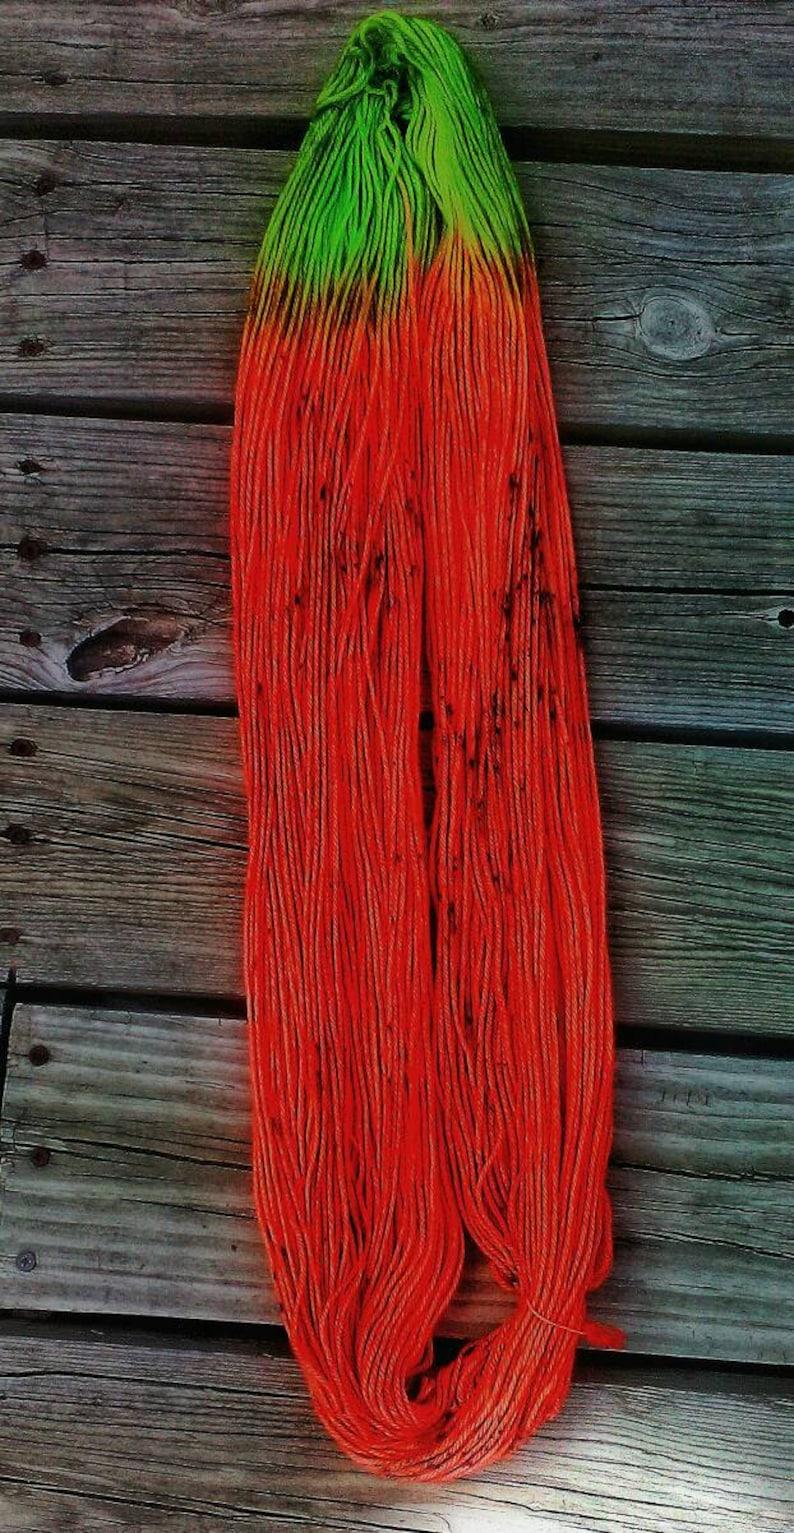 DK yarn The Psychodelic Sheep Hand dyed yarn Far Out Base Indie dyed yarn Watermelon Colorway PREORDER